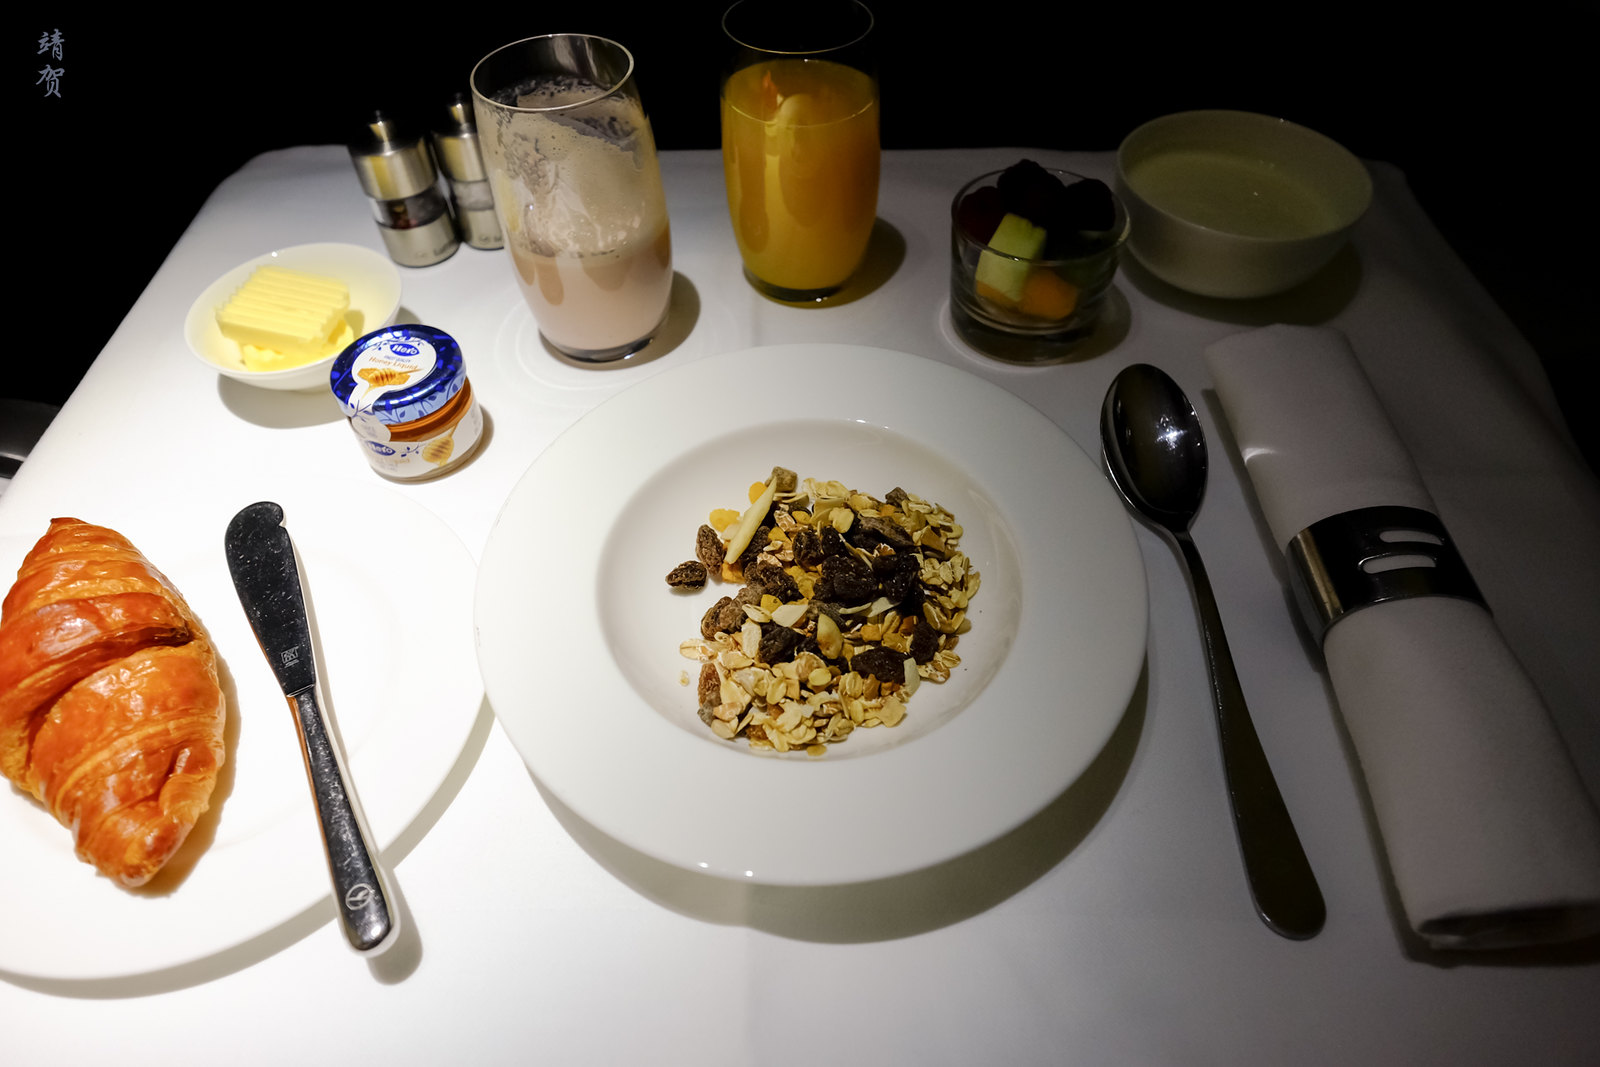 Muesli and croissant